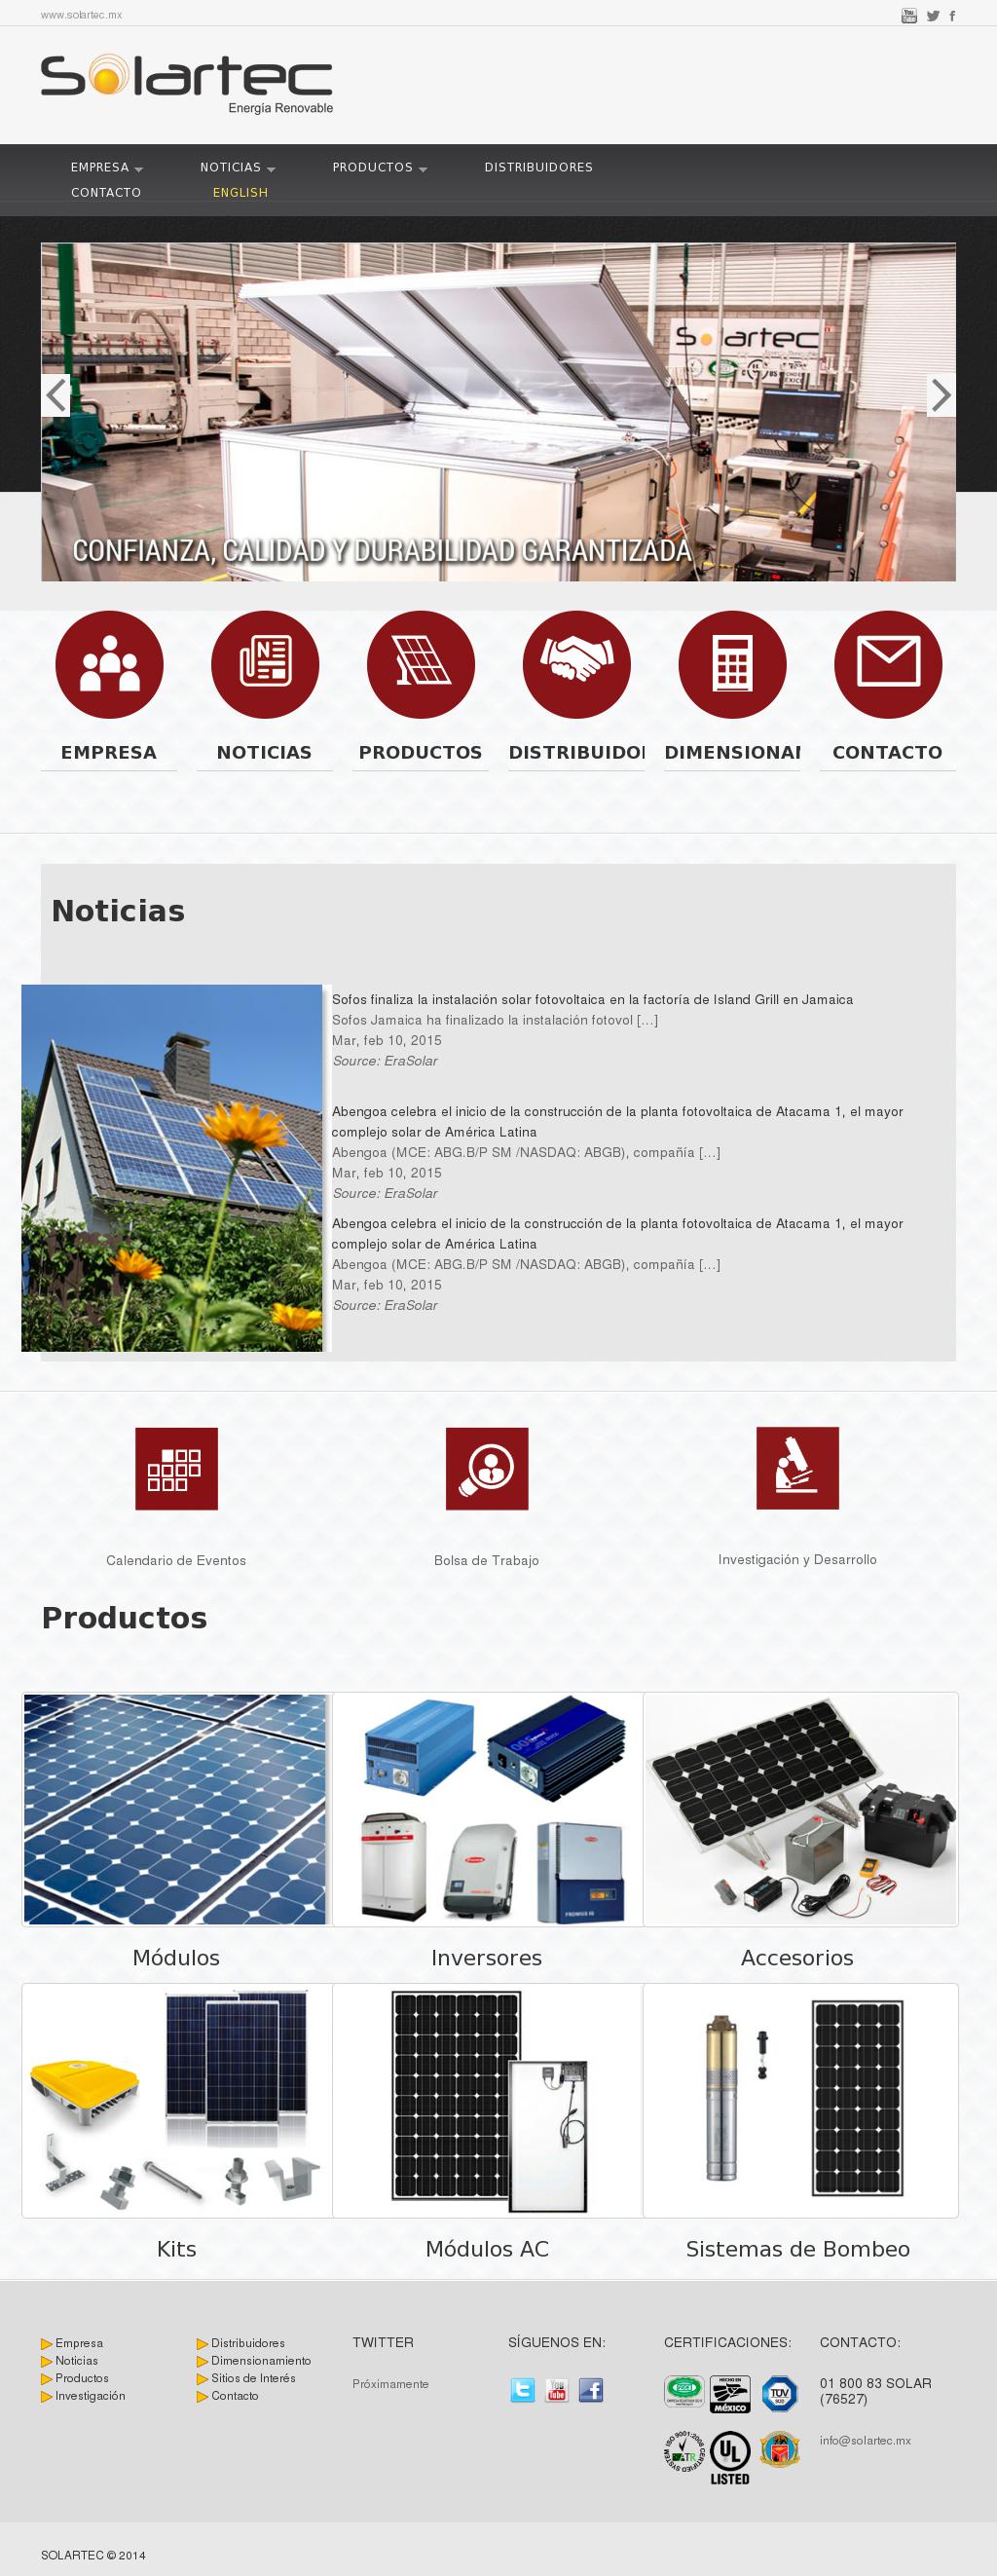 Calendario Nasdaq.Solartec Competitors Revenue And Employees Owler Company